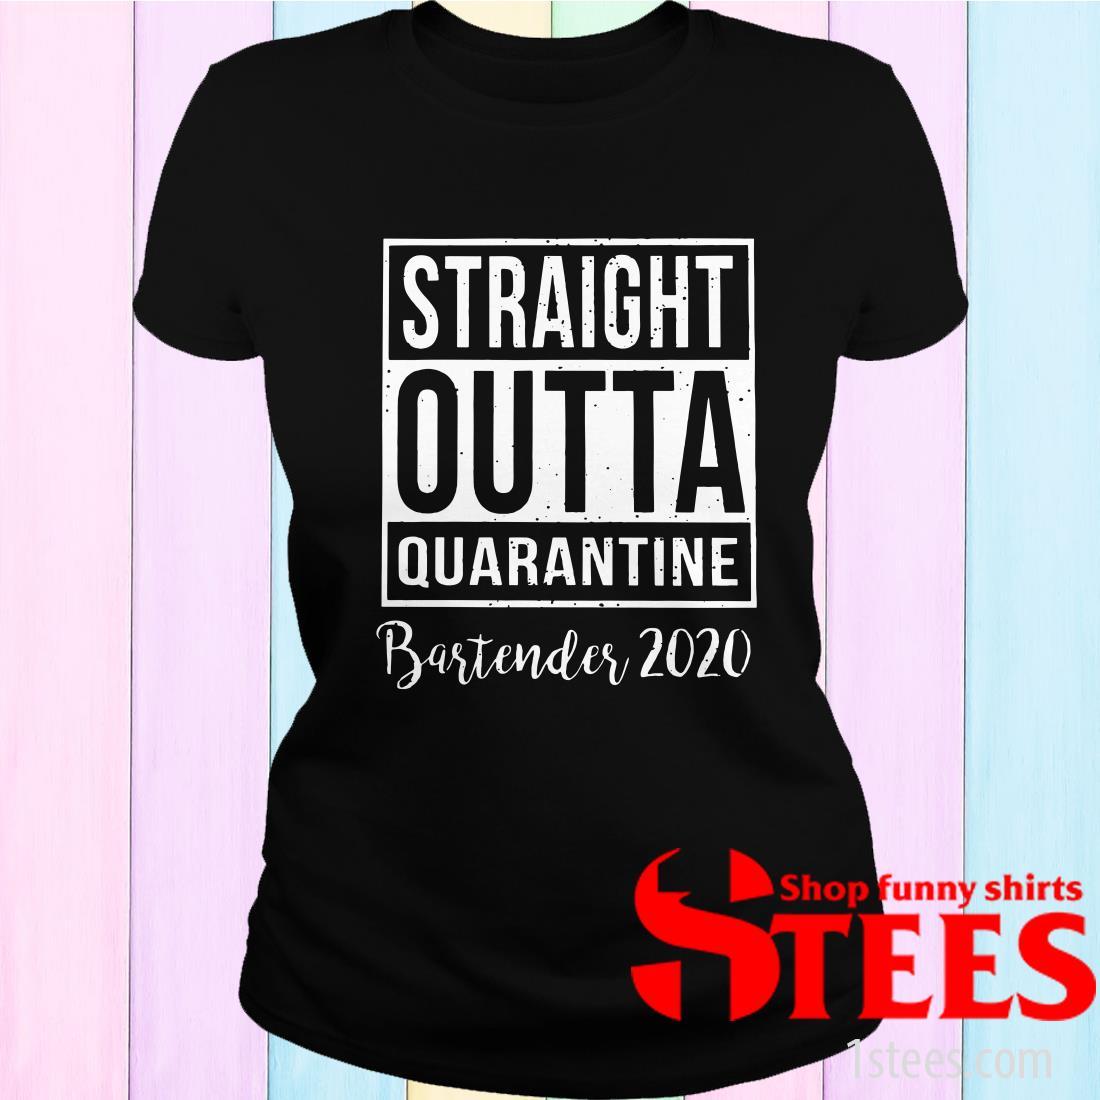 2020 Straight Outta Quarantine Bartender Women's T-Shirt